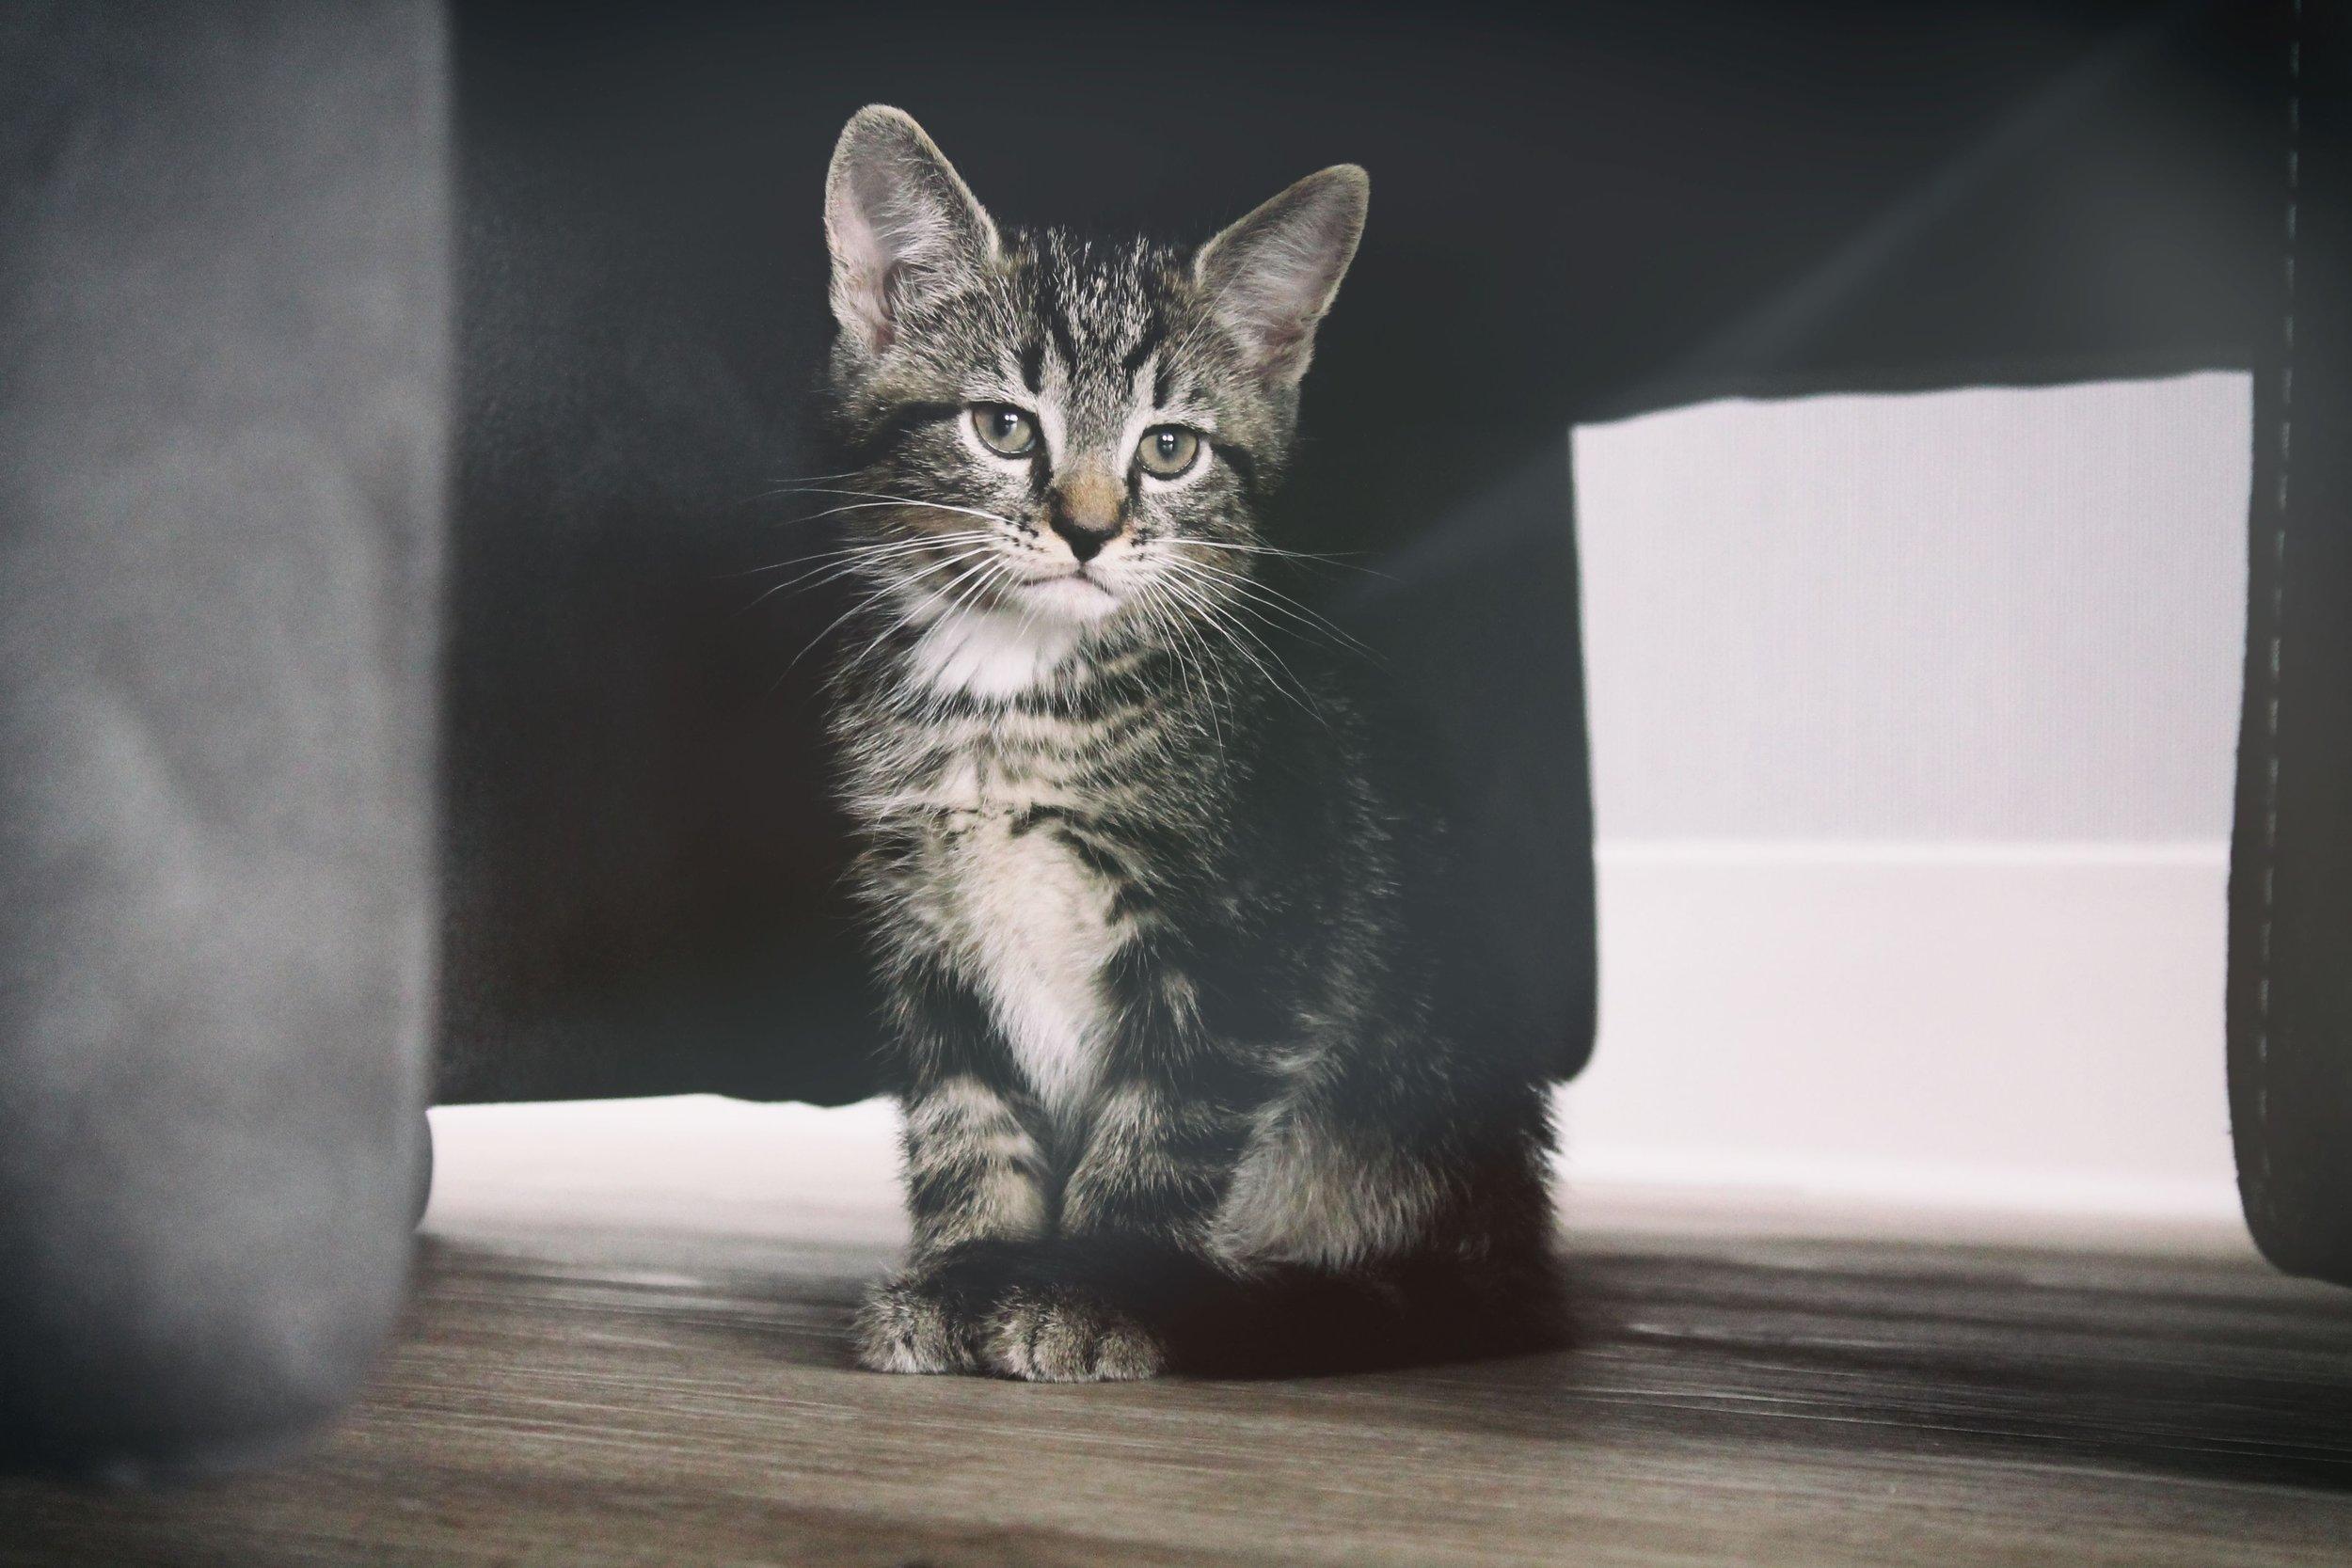 male kitten males cats female kittens female cats #femalecats #malecats